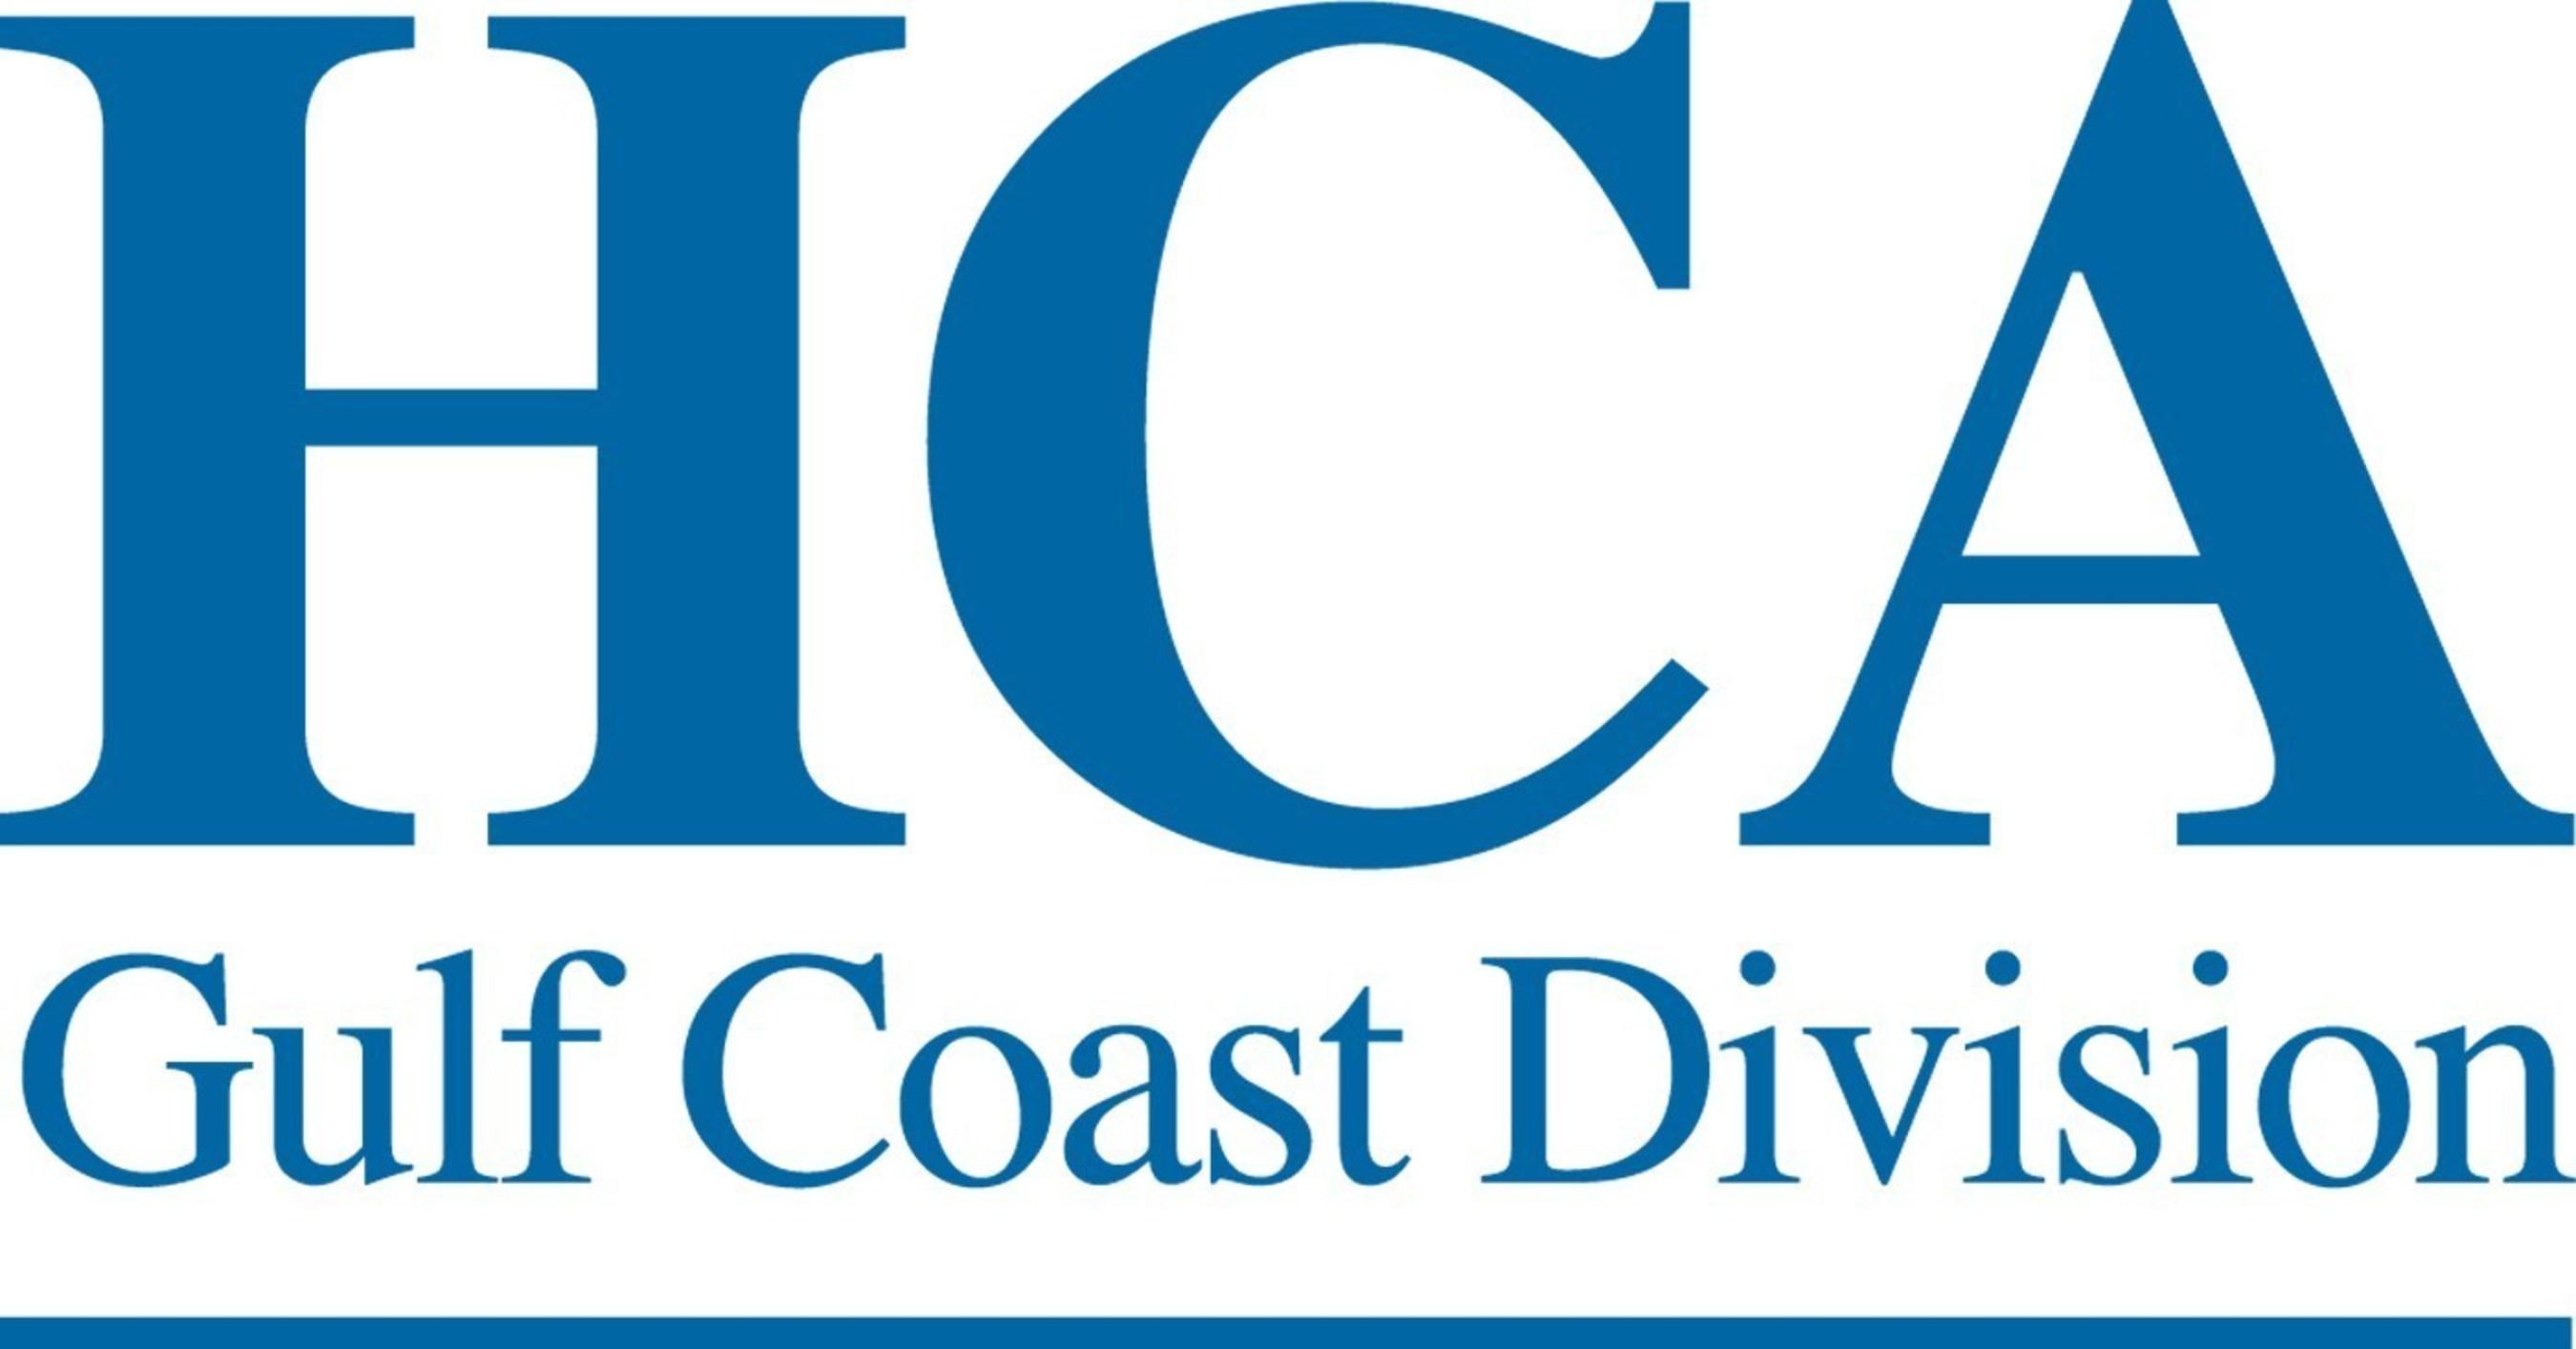 HCA Gulf Coast Division logo